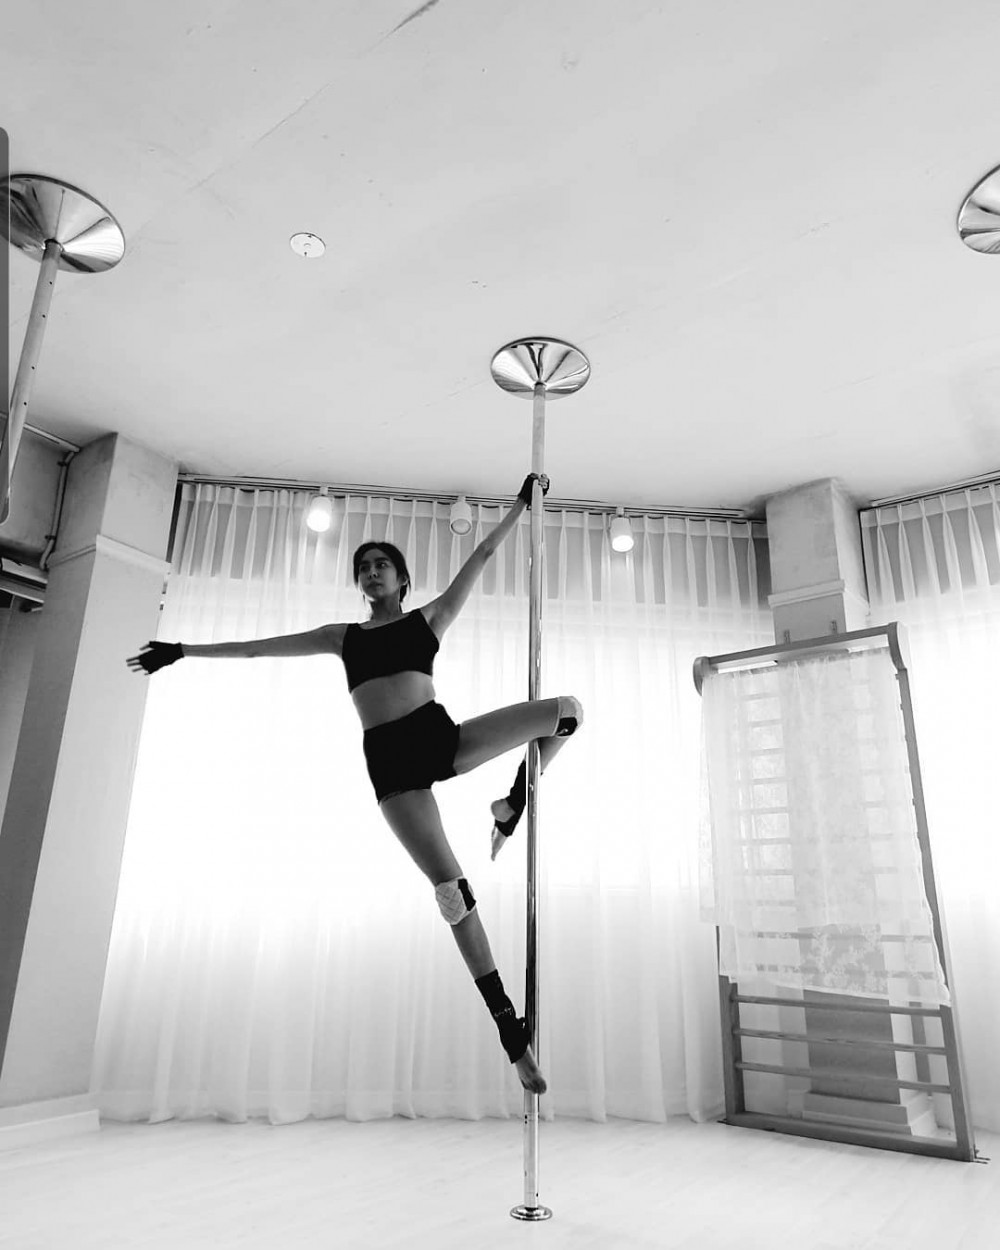 UEE shows off her pole dancing skills on Instagram   allkpop